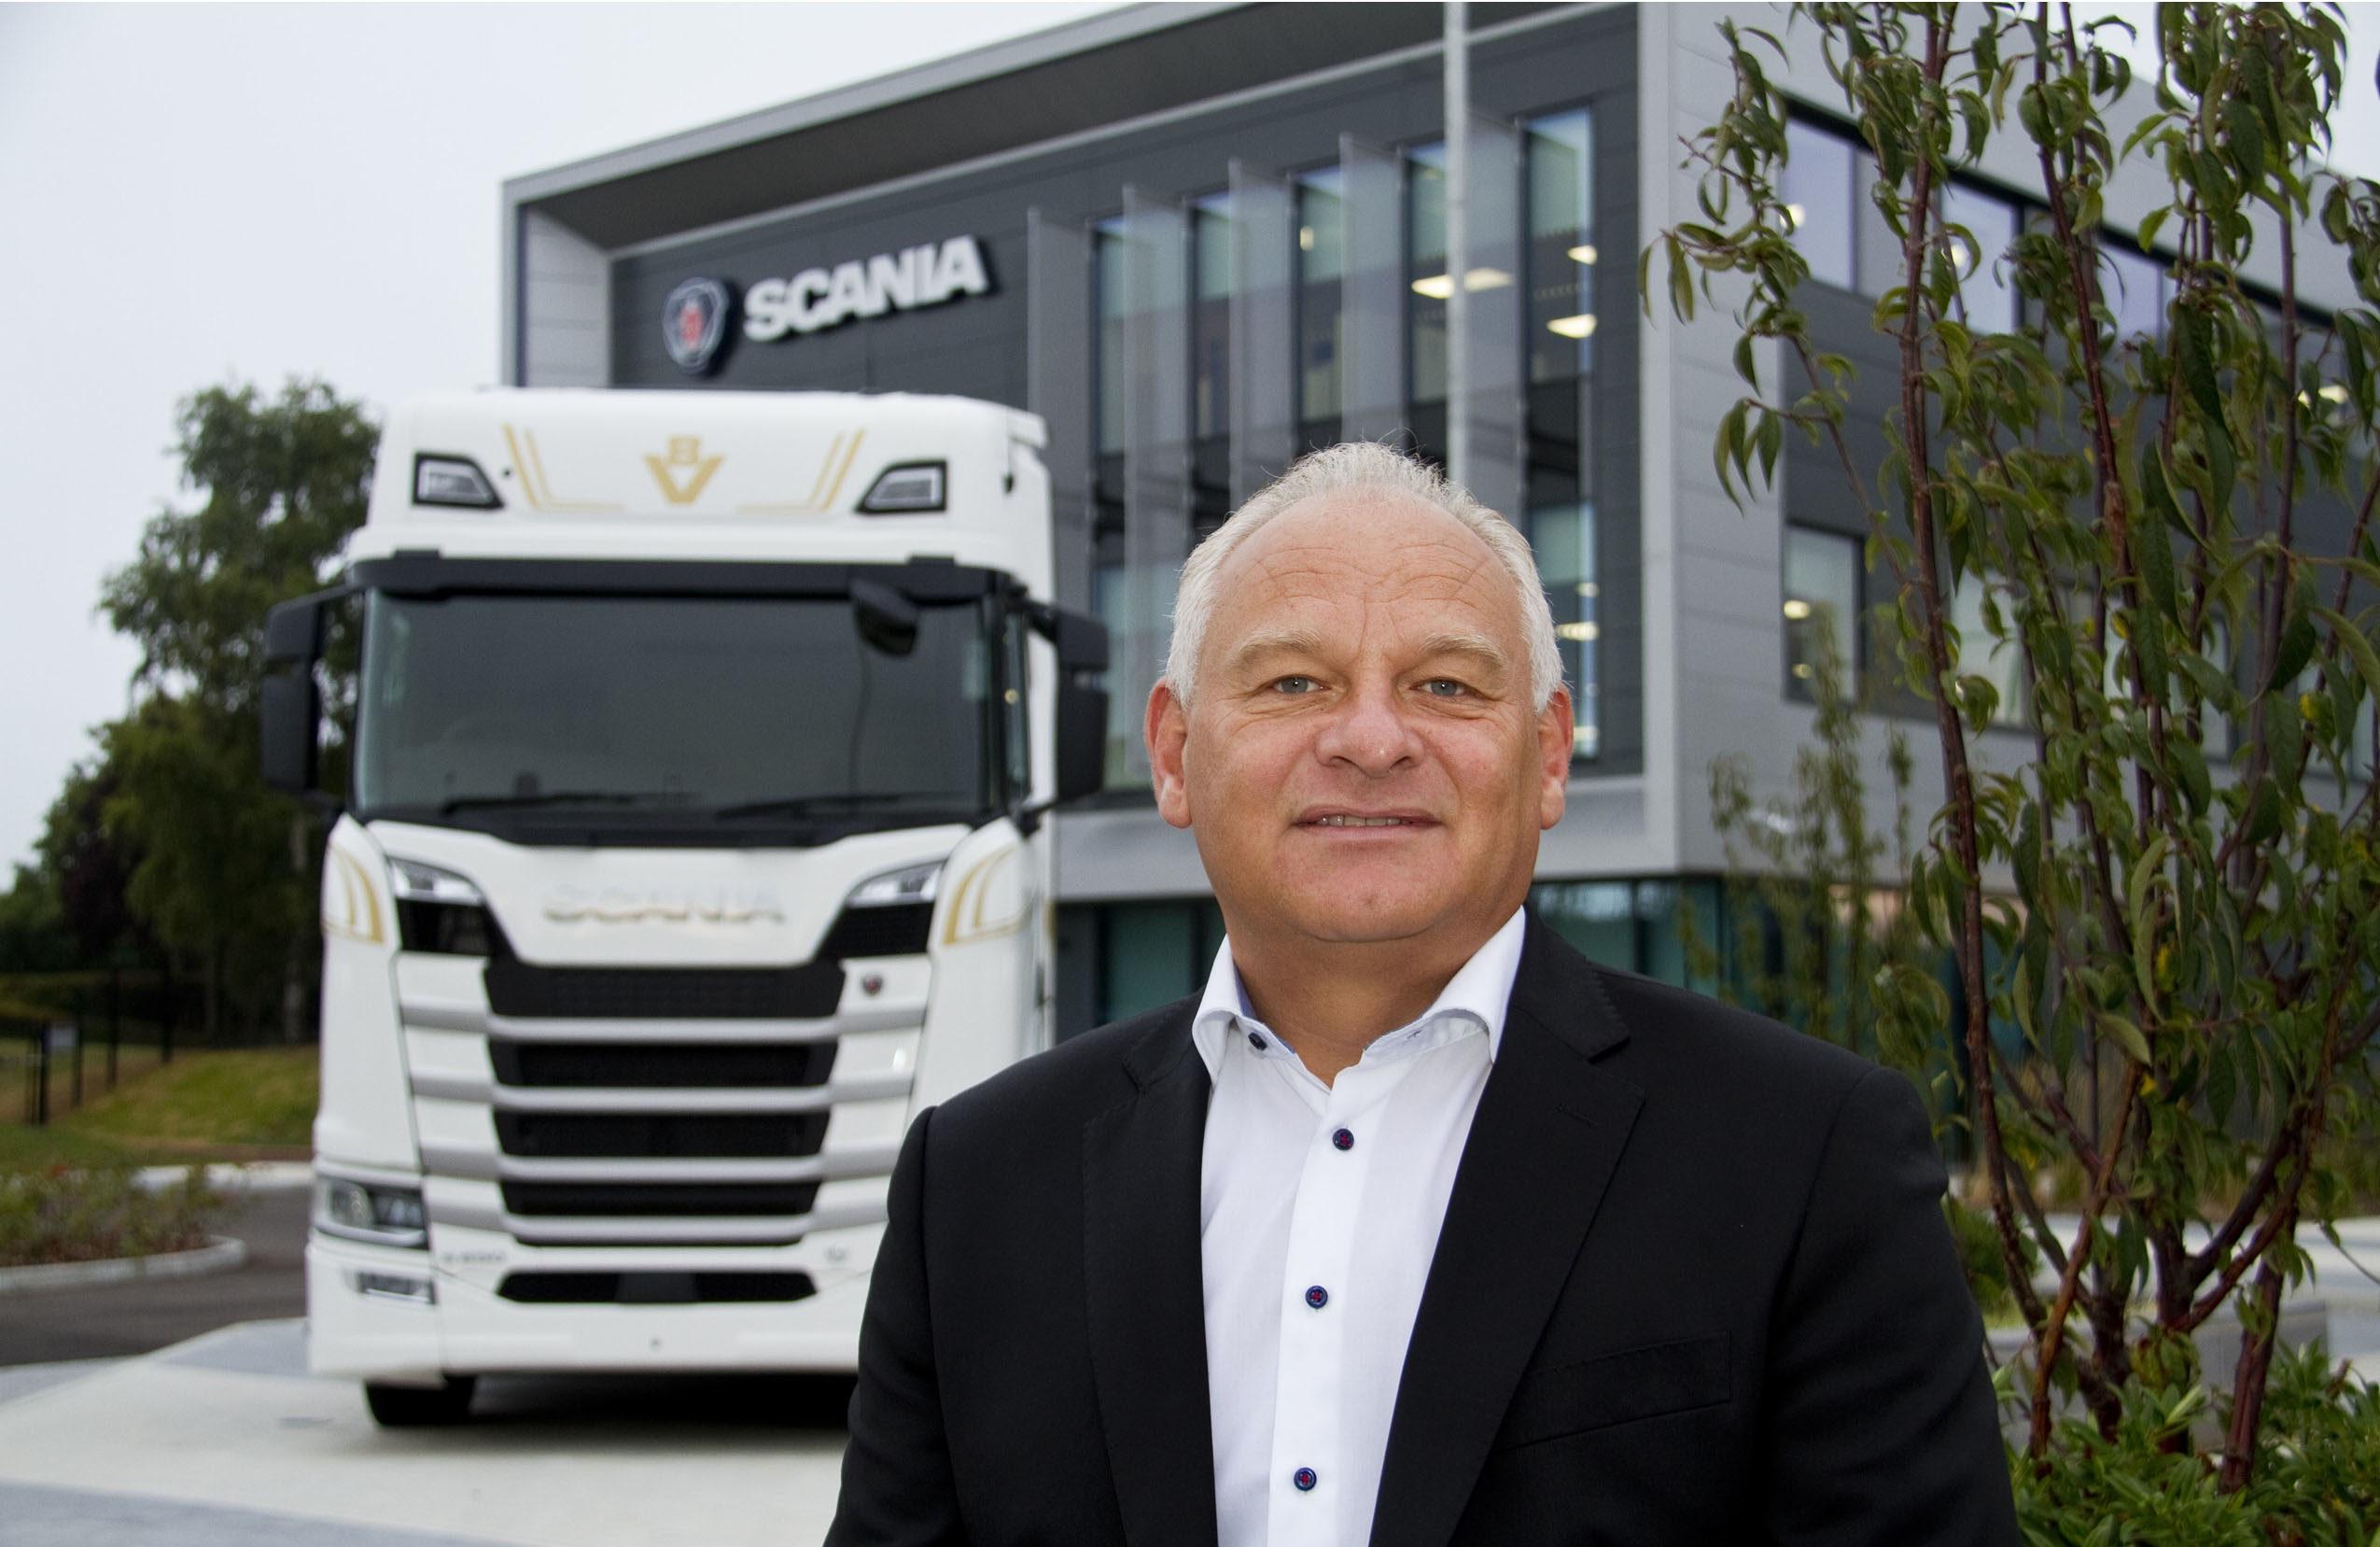 Martin Hay steps down at Scania